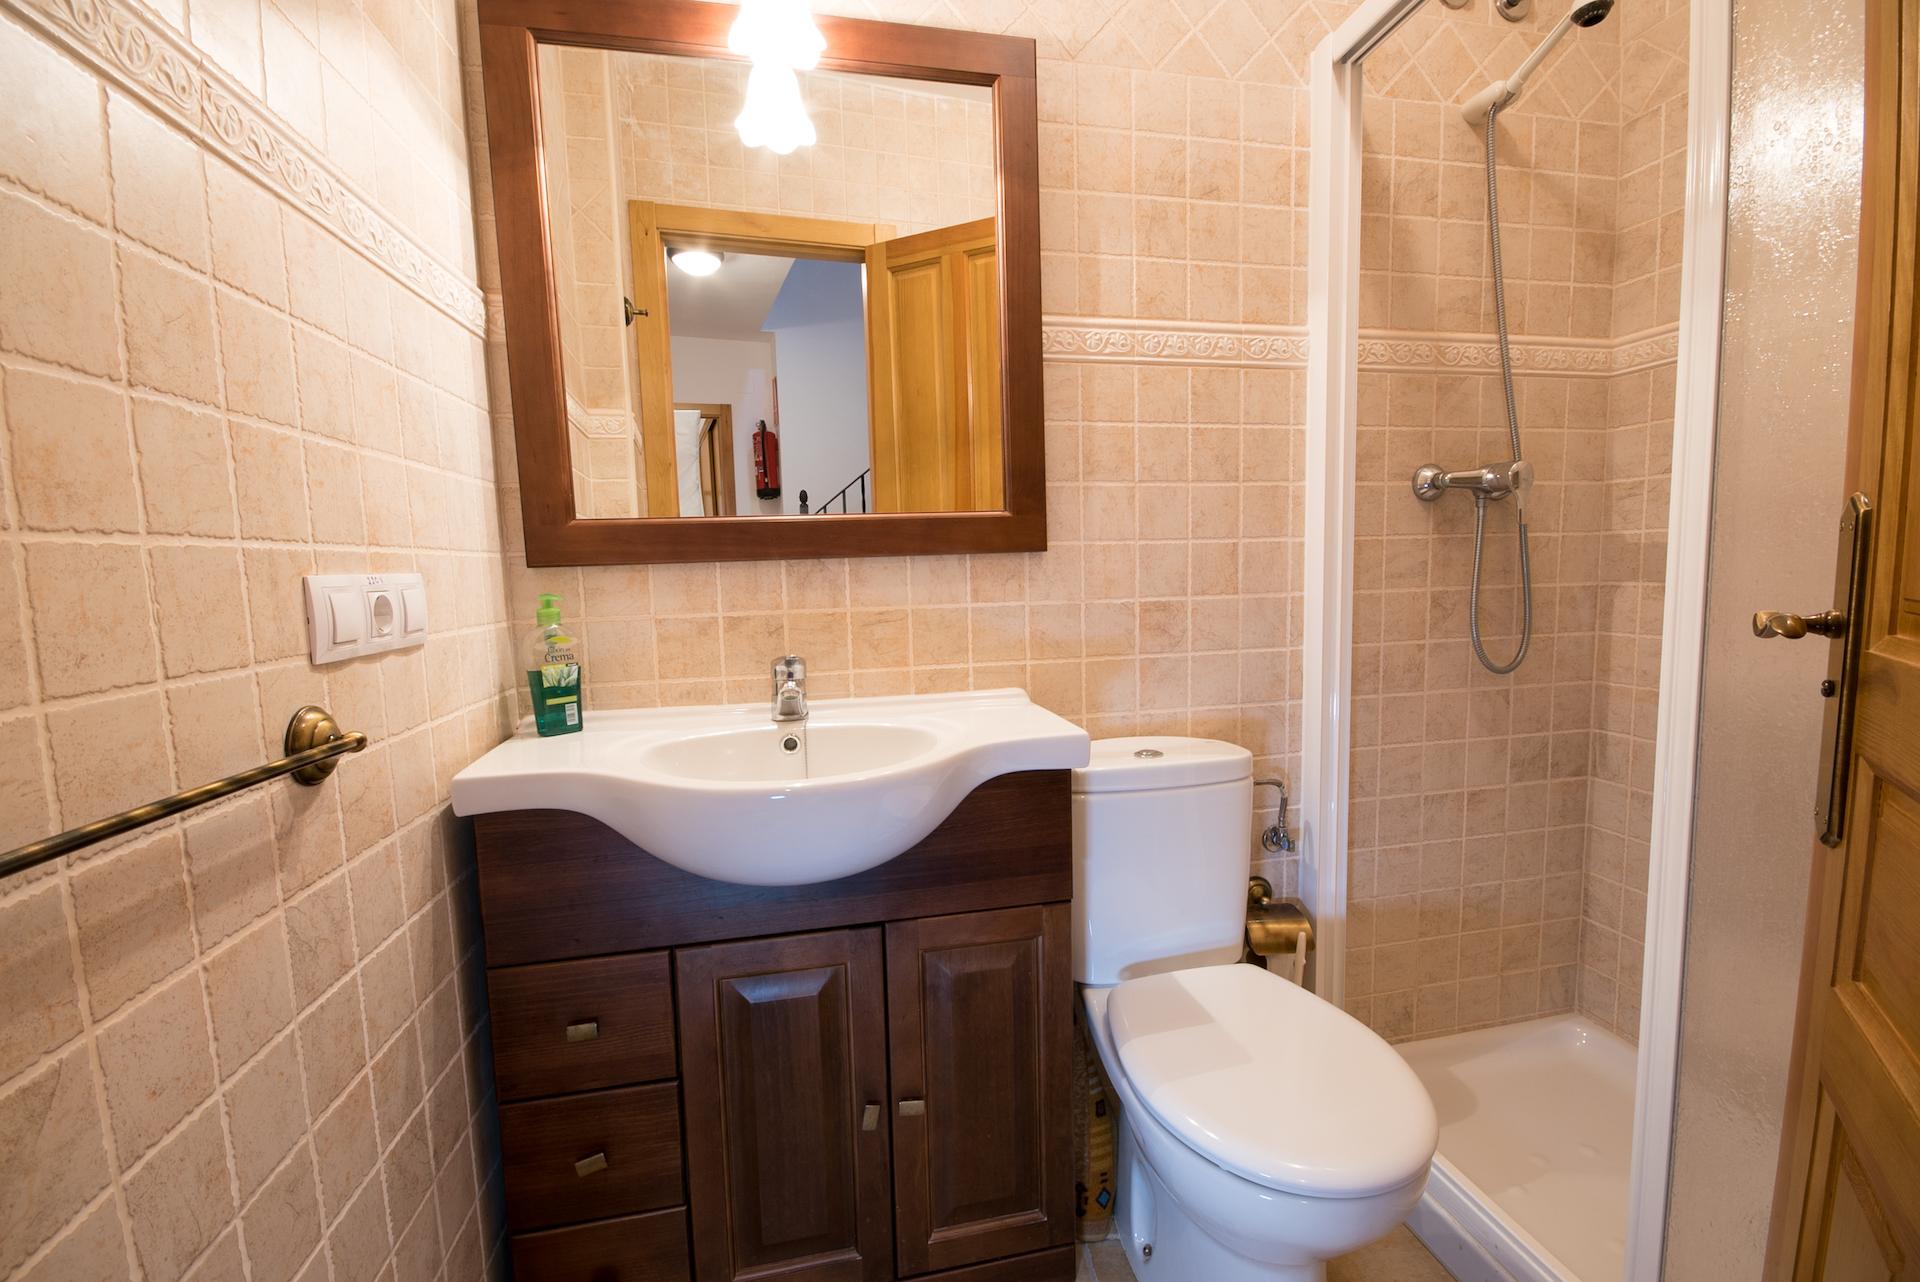 Benafer - Casa Arminda - Baño con plato de ducha